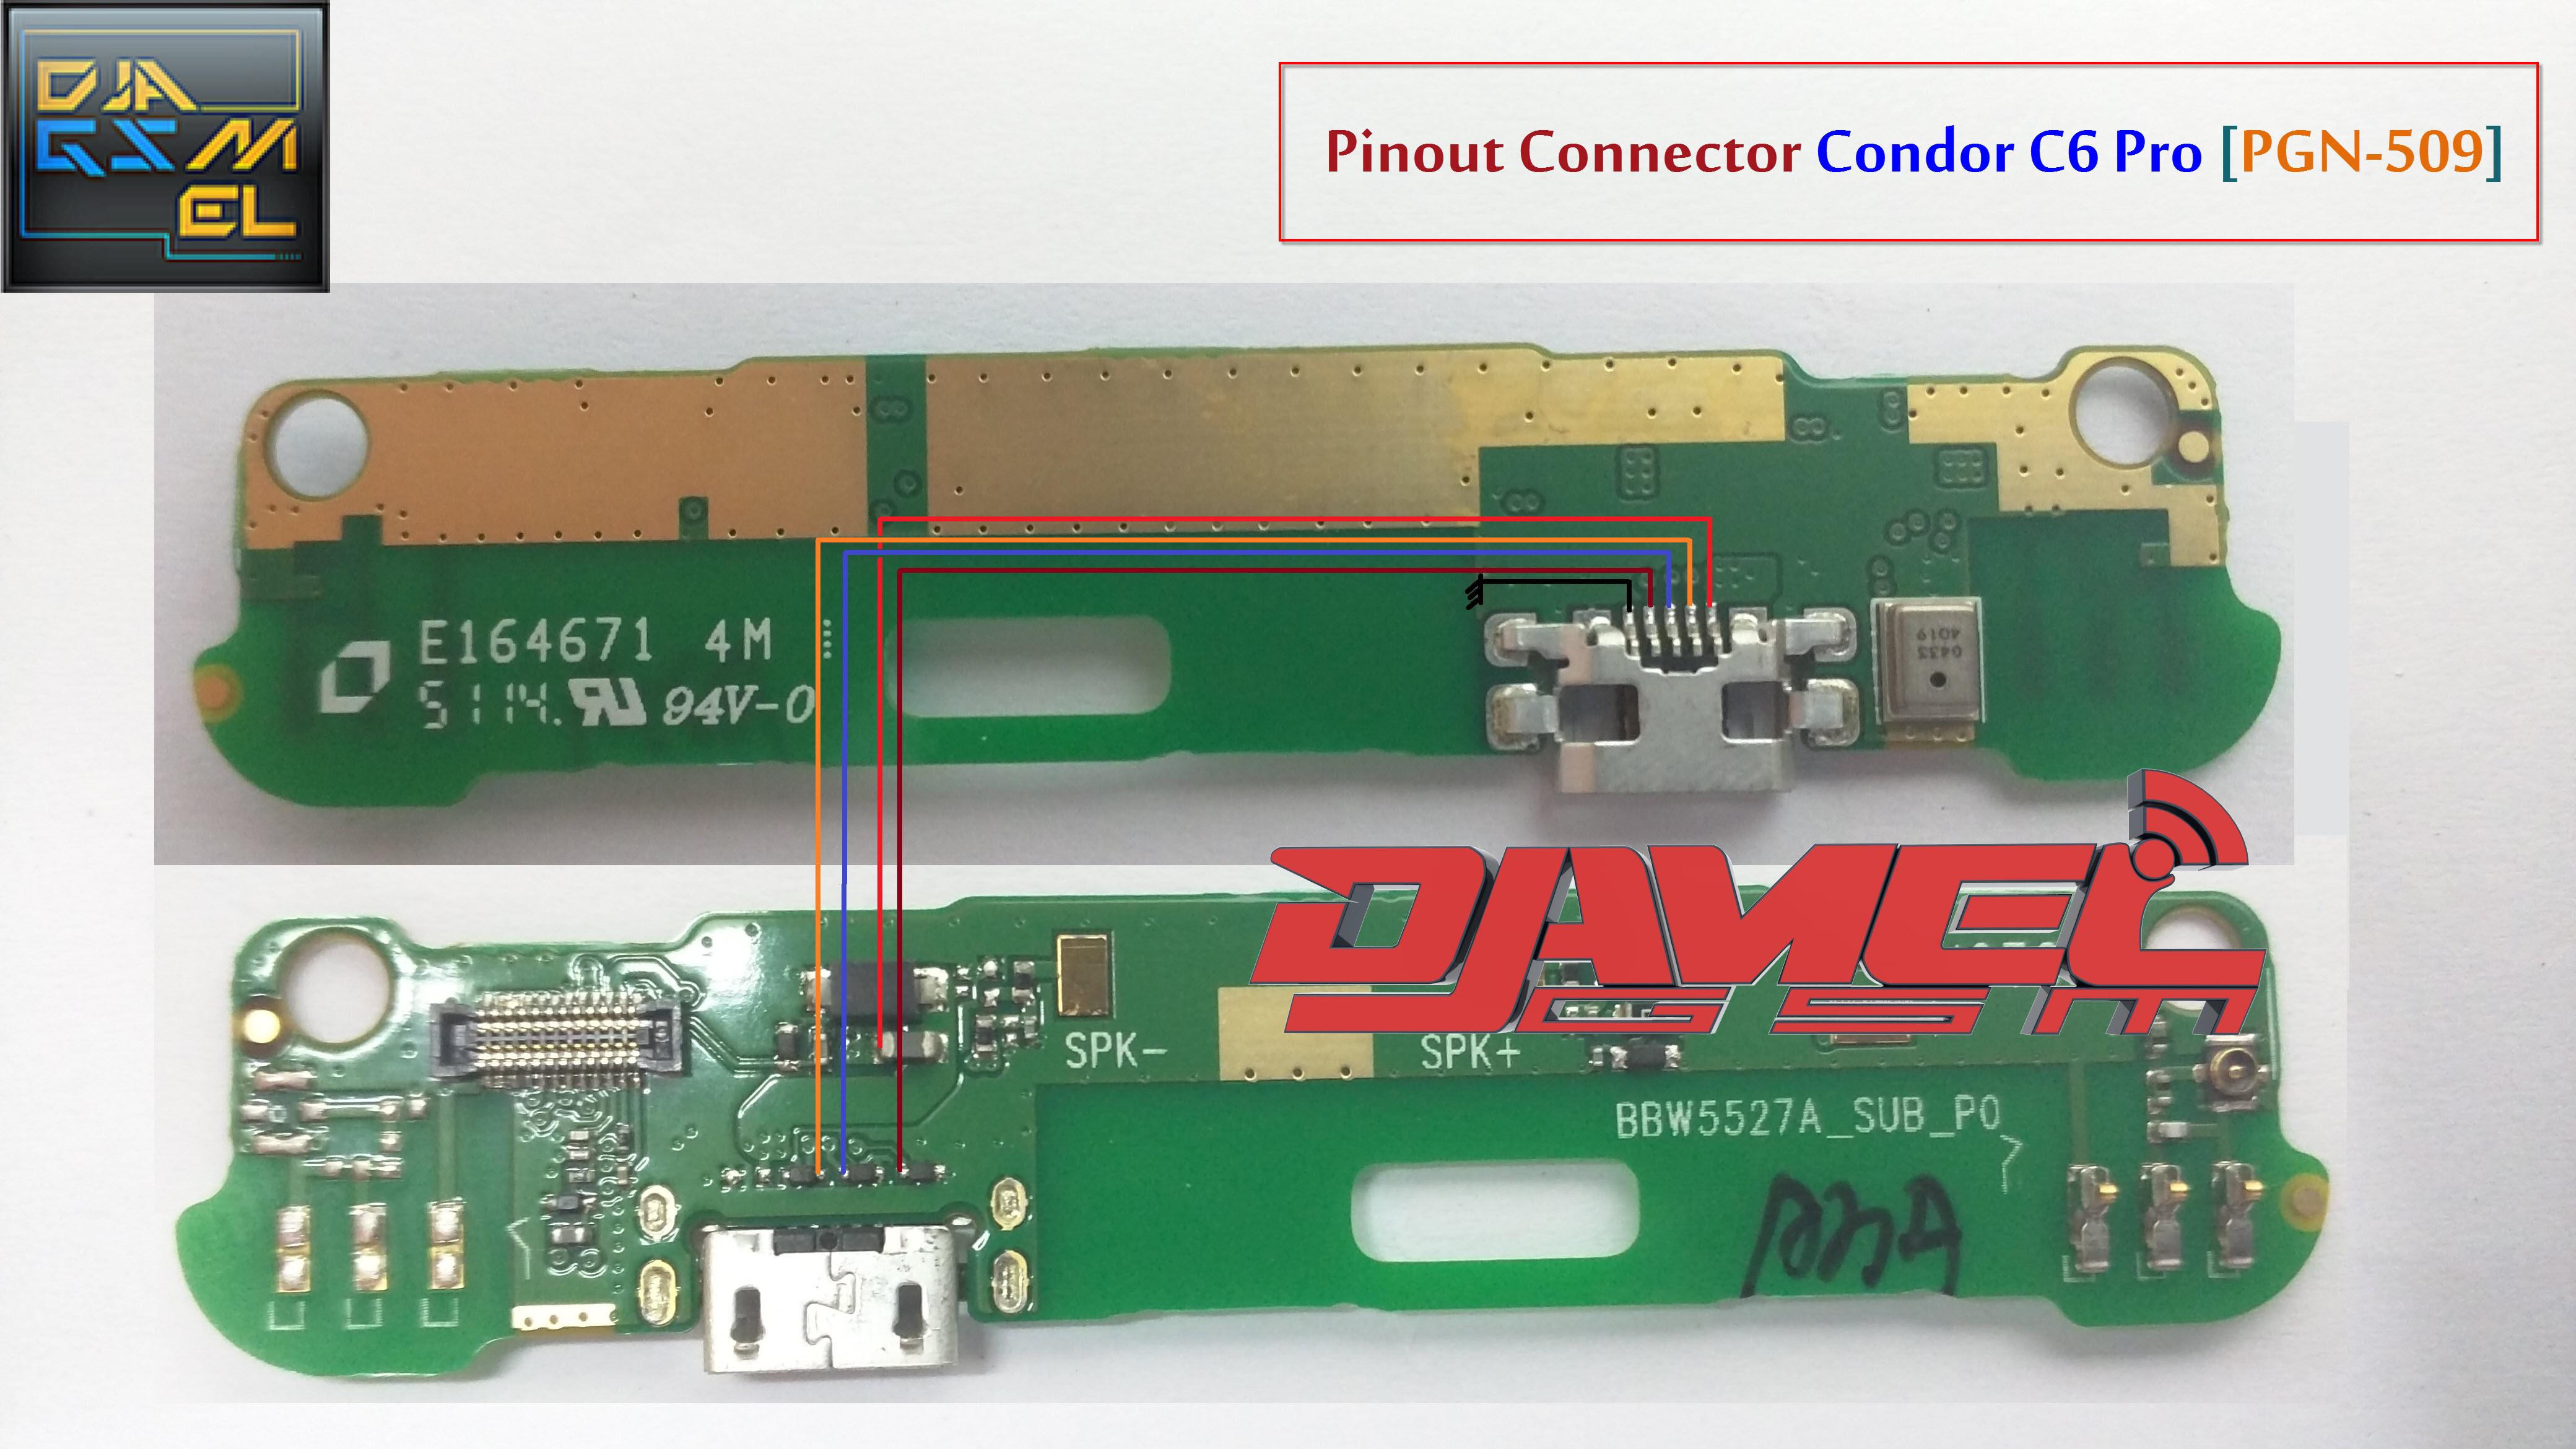 Pinout Connector C6 Pro PGN-509